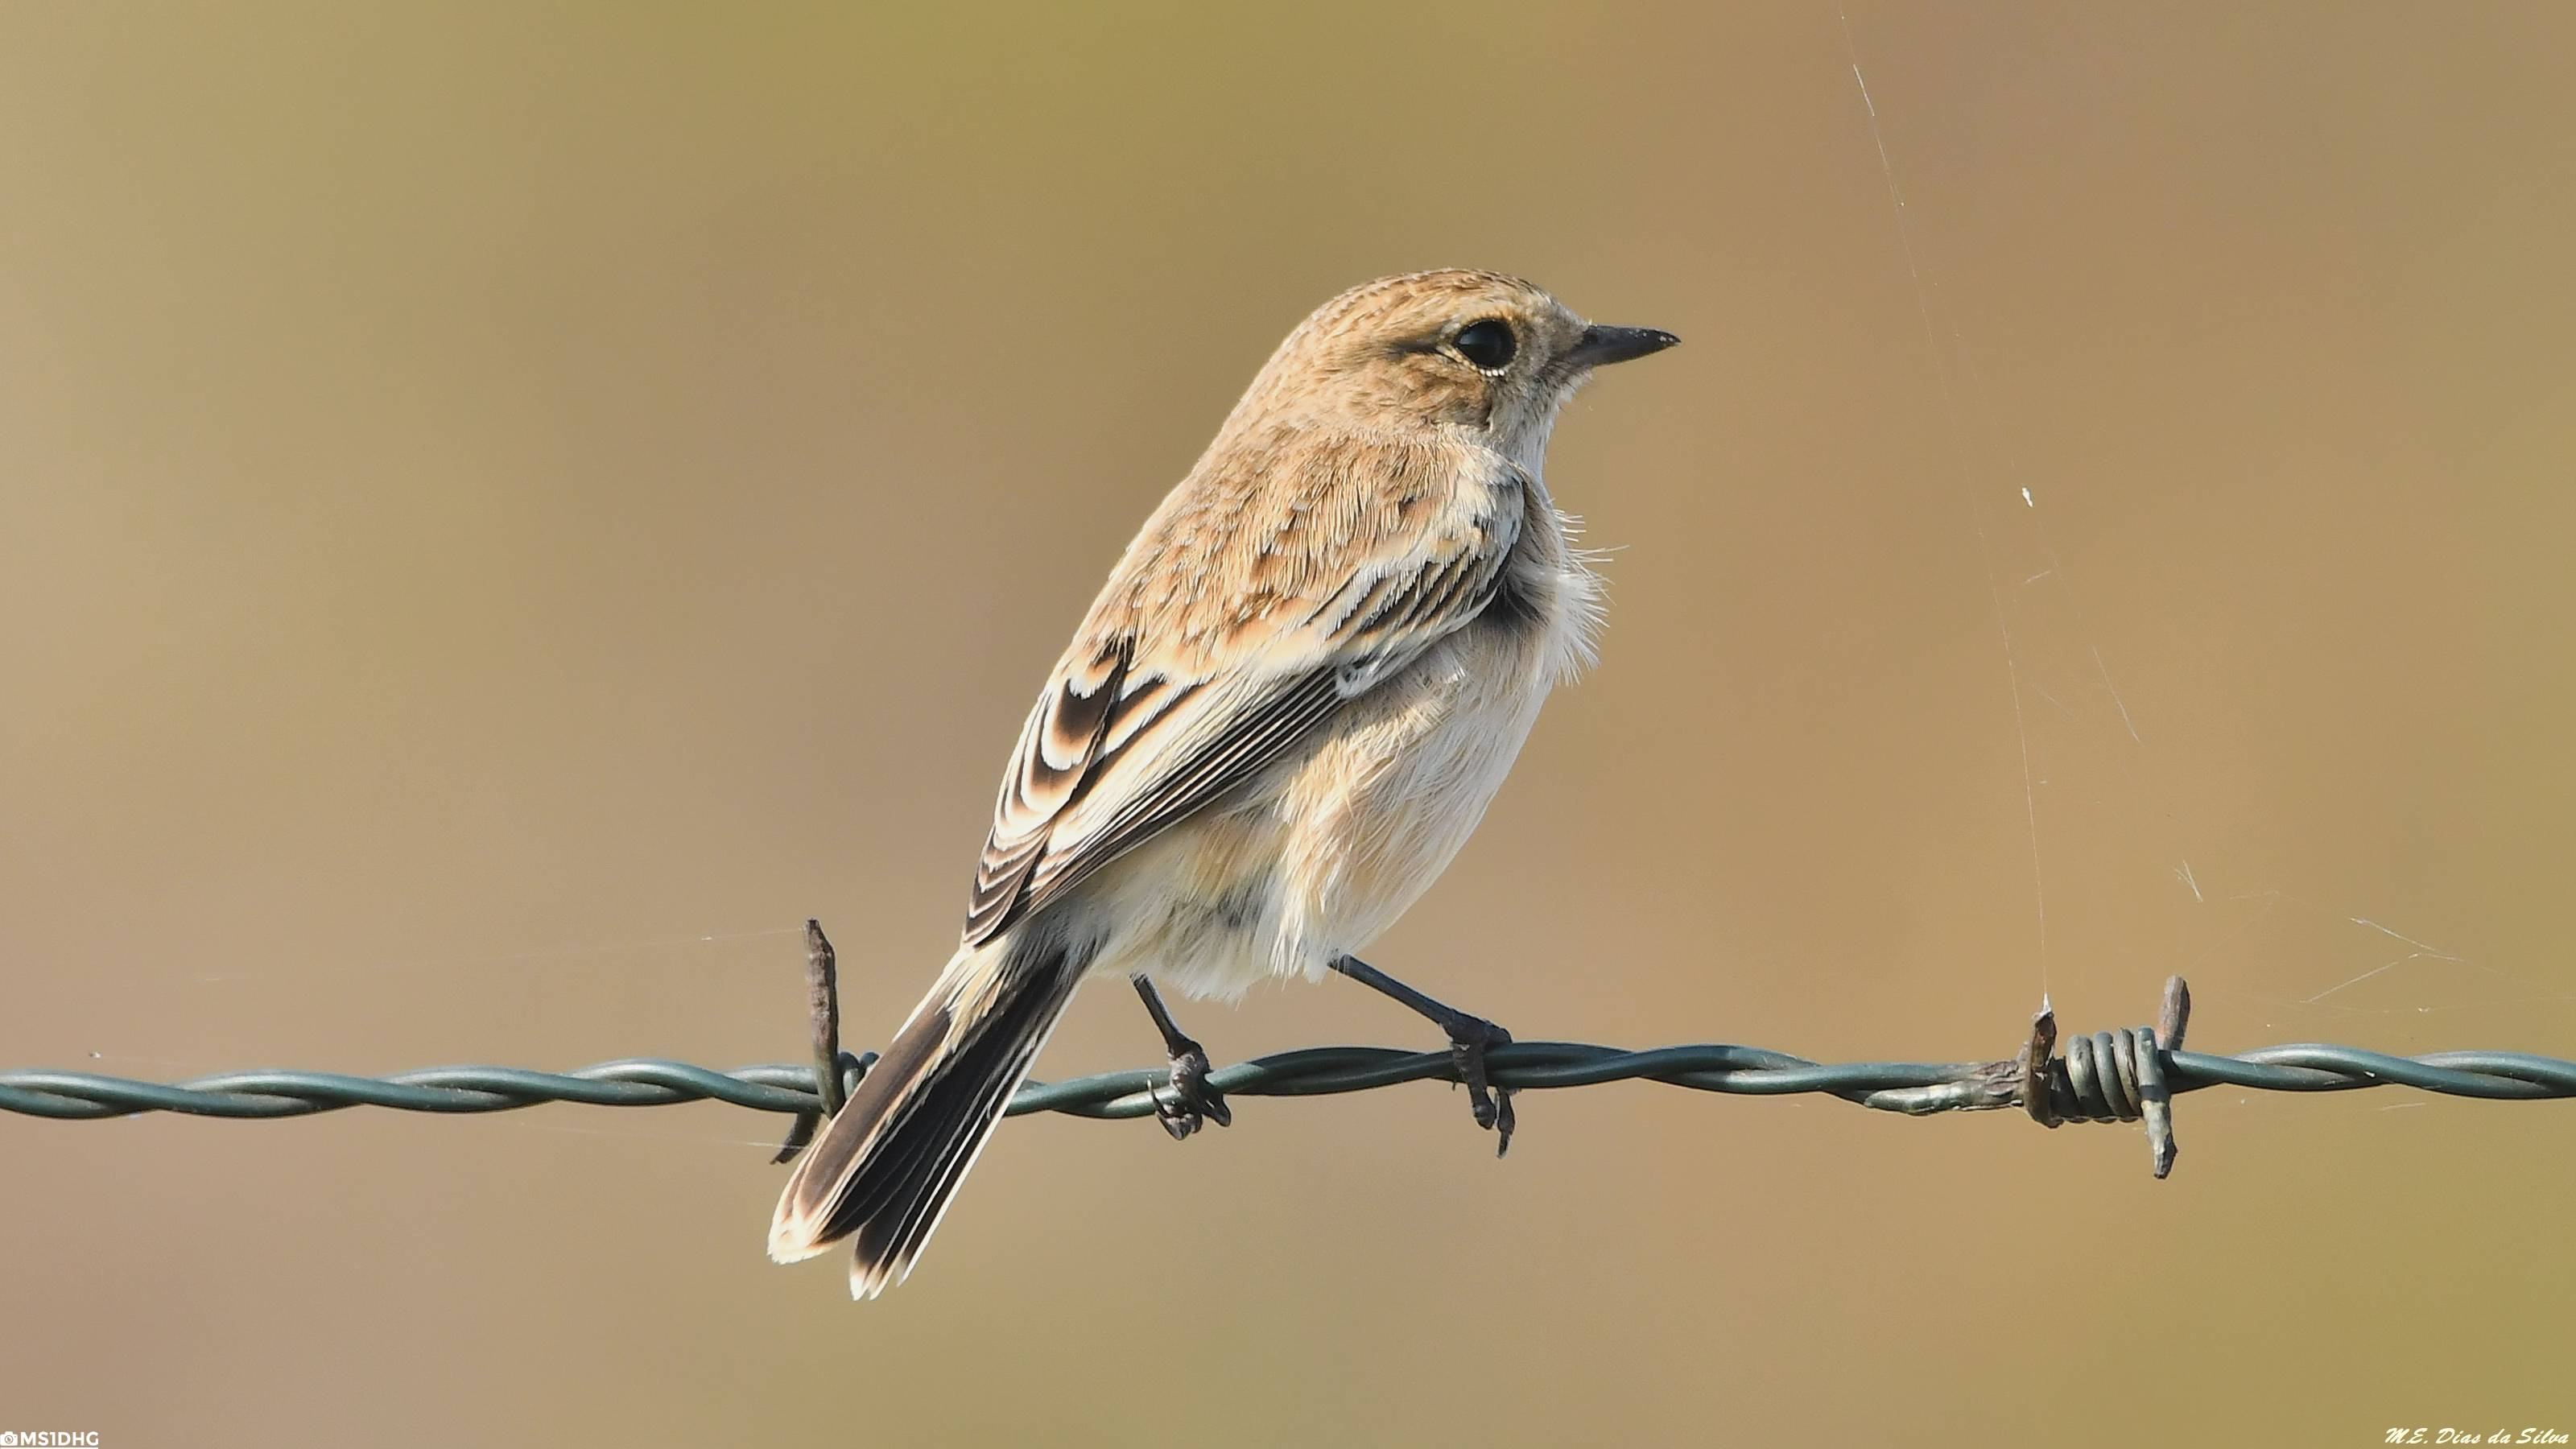 Fórum Aves - Birdwatching em Portugal - Portal Cartaxo%20siberiano%20(2)